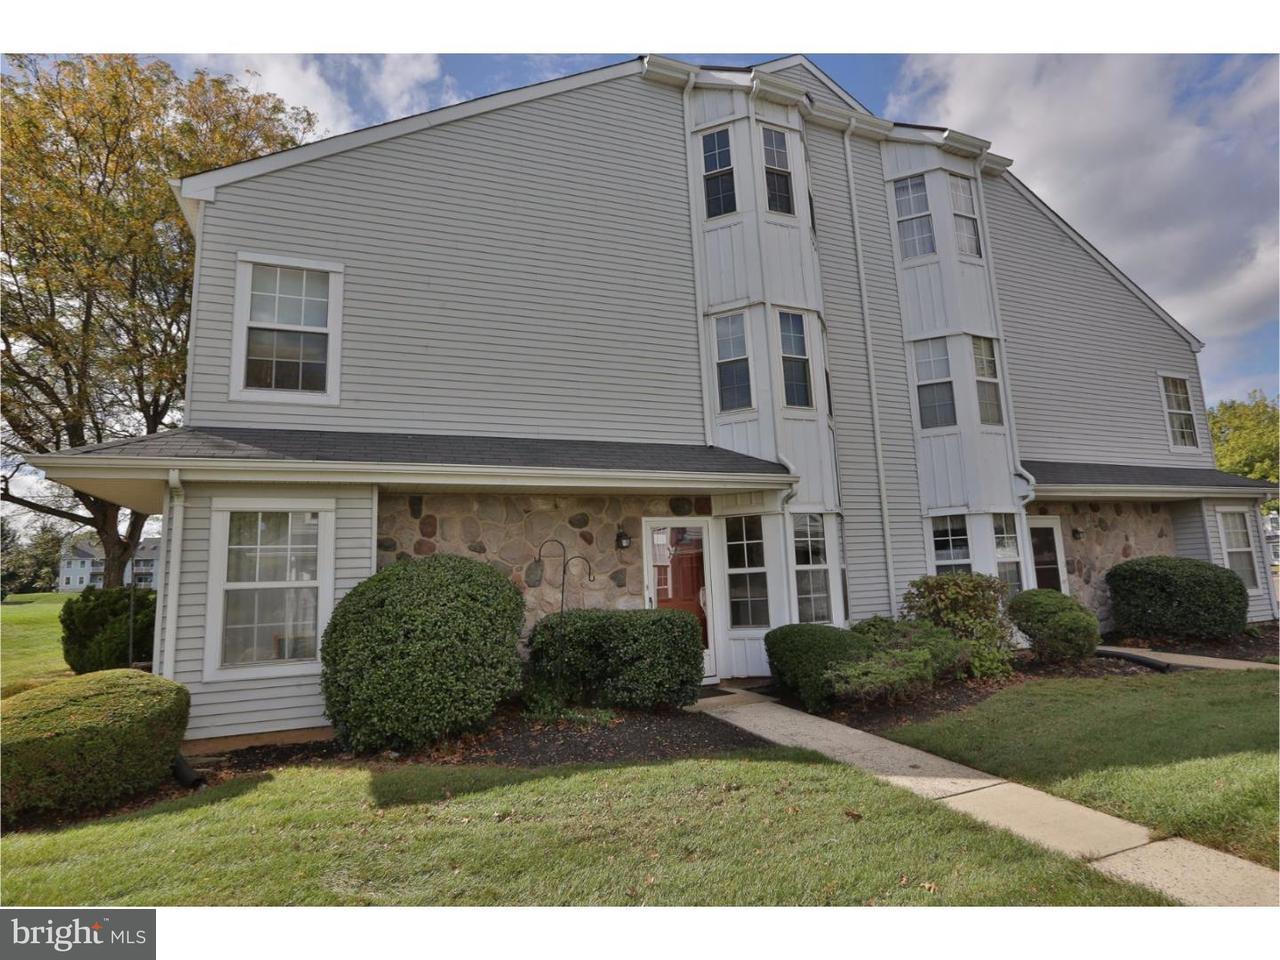 Condominium for Rent at 15015 HOPKINS CT #770A Southampton, Pennsylvania 18966 United States